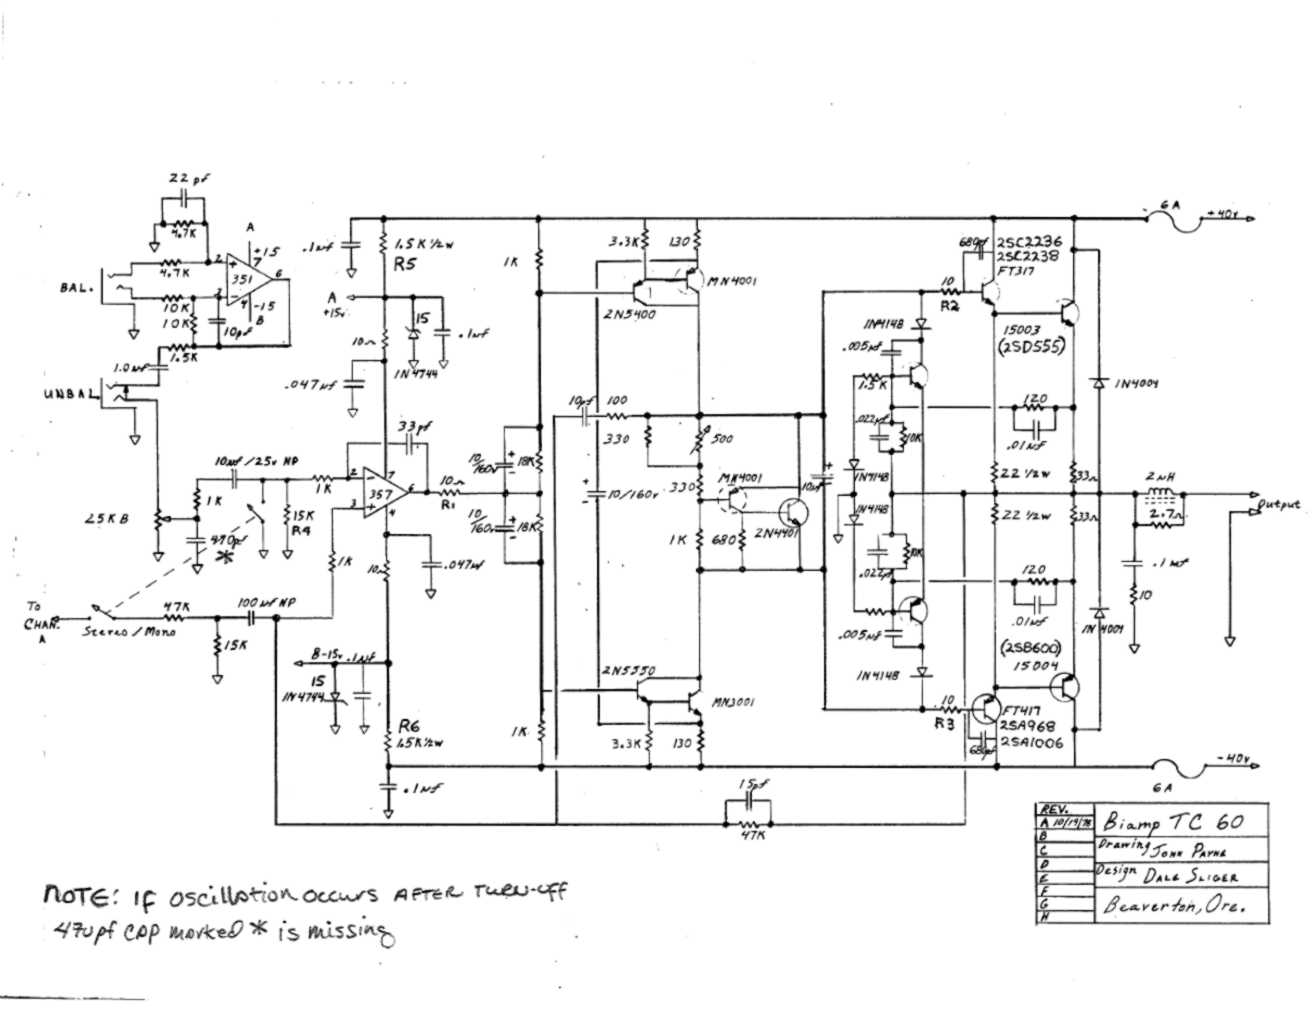 70v wiring diagram  70v  get free image about wiring diagram